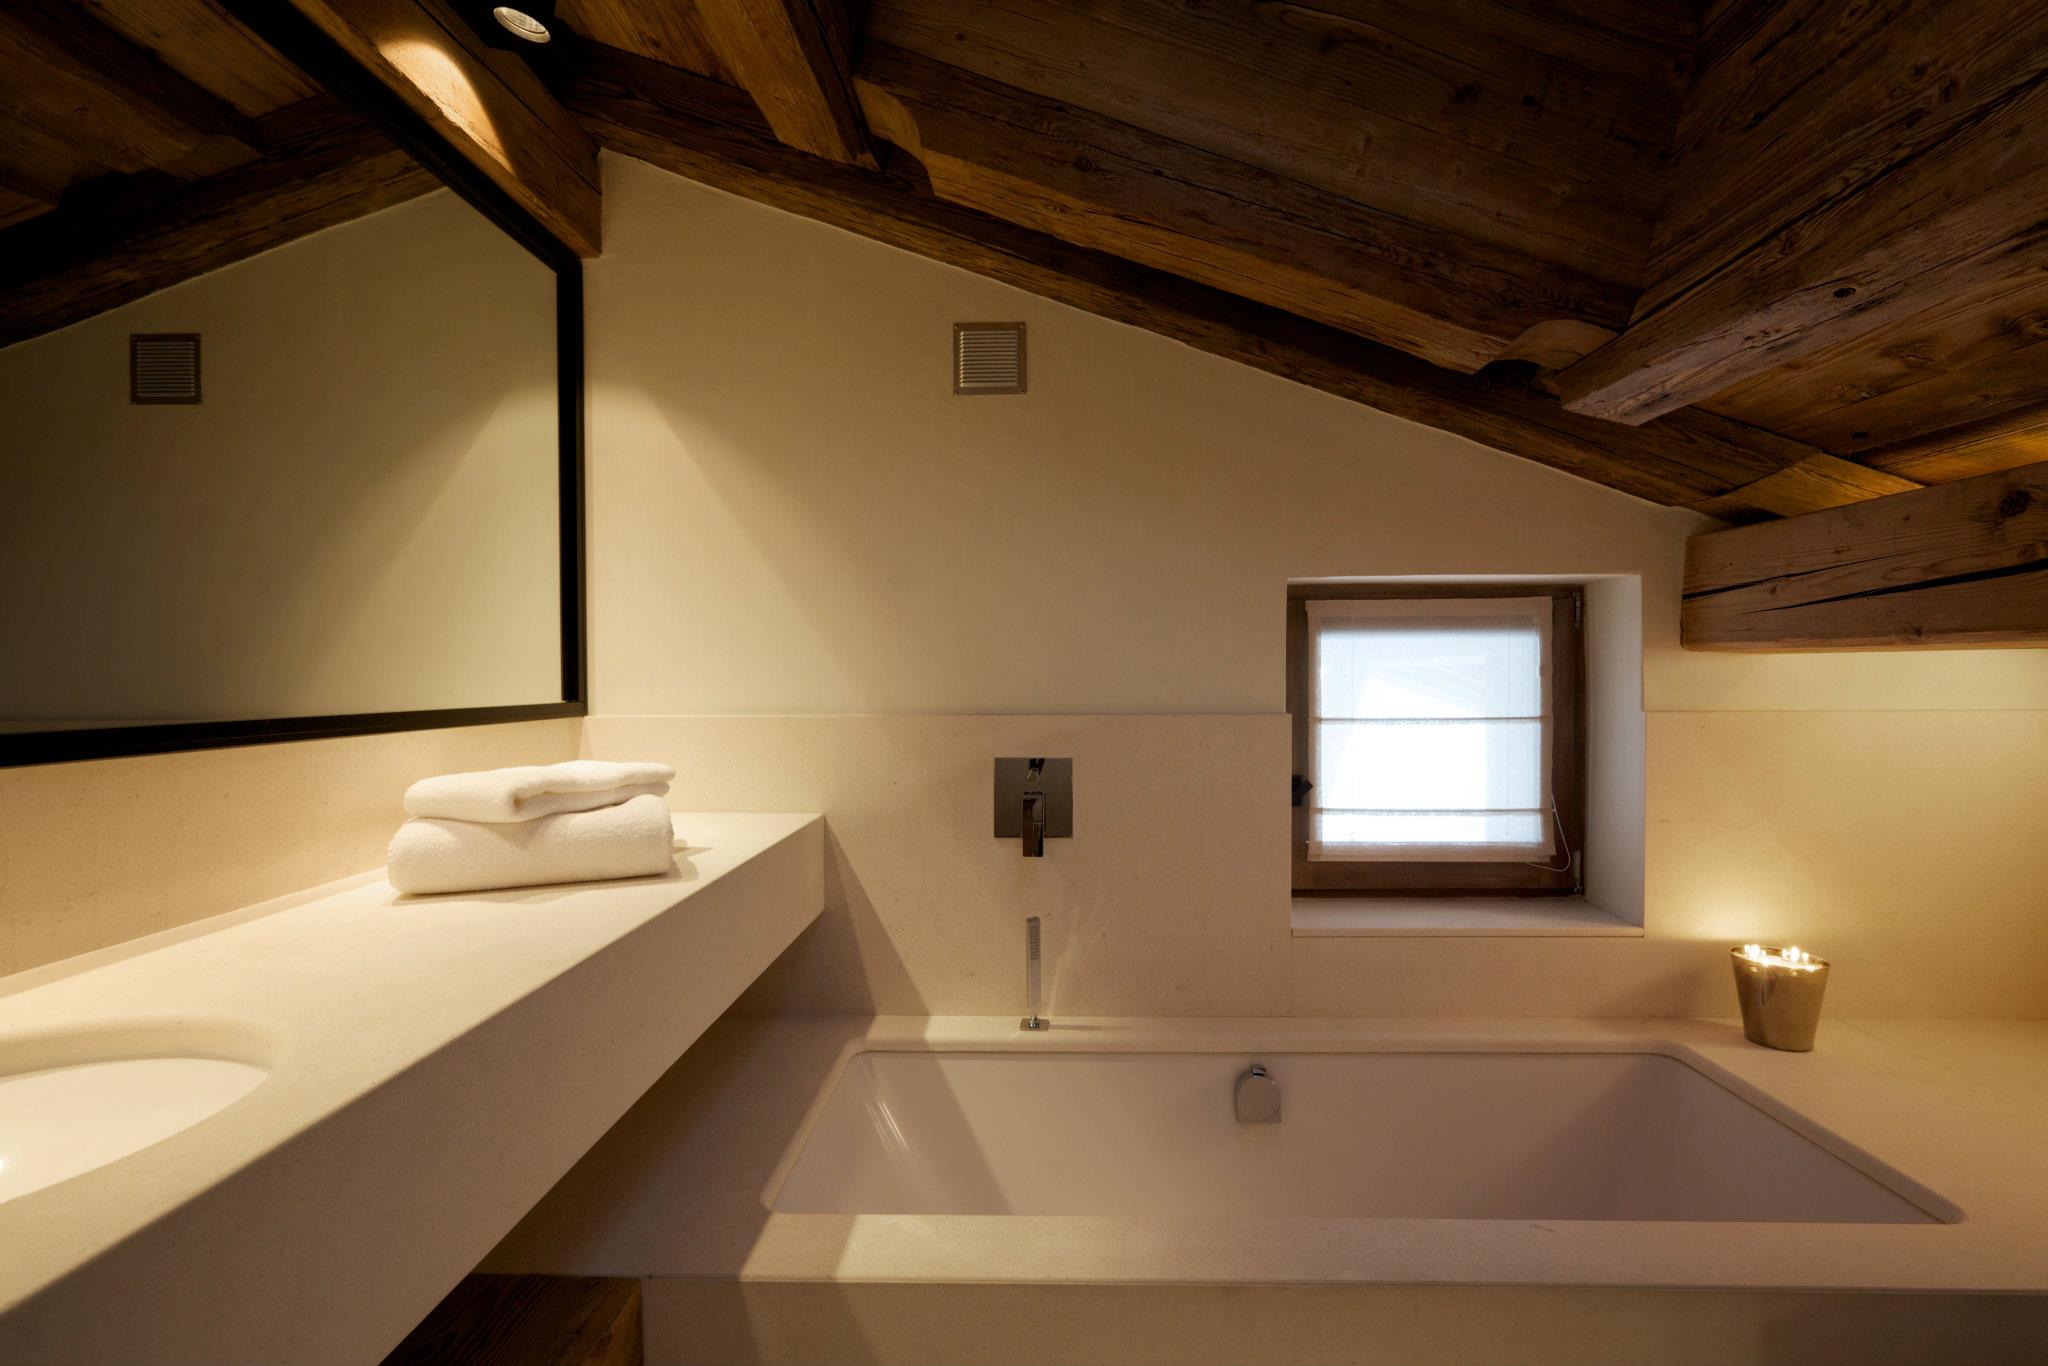 attic staircase design ideas - Chalet Cyanella by Bo Design 30